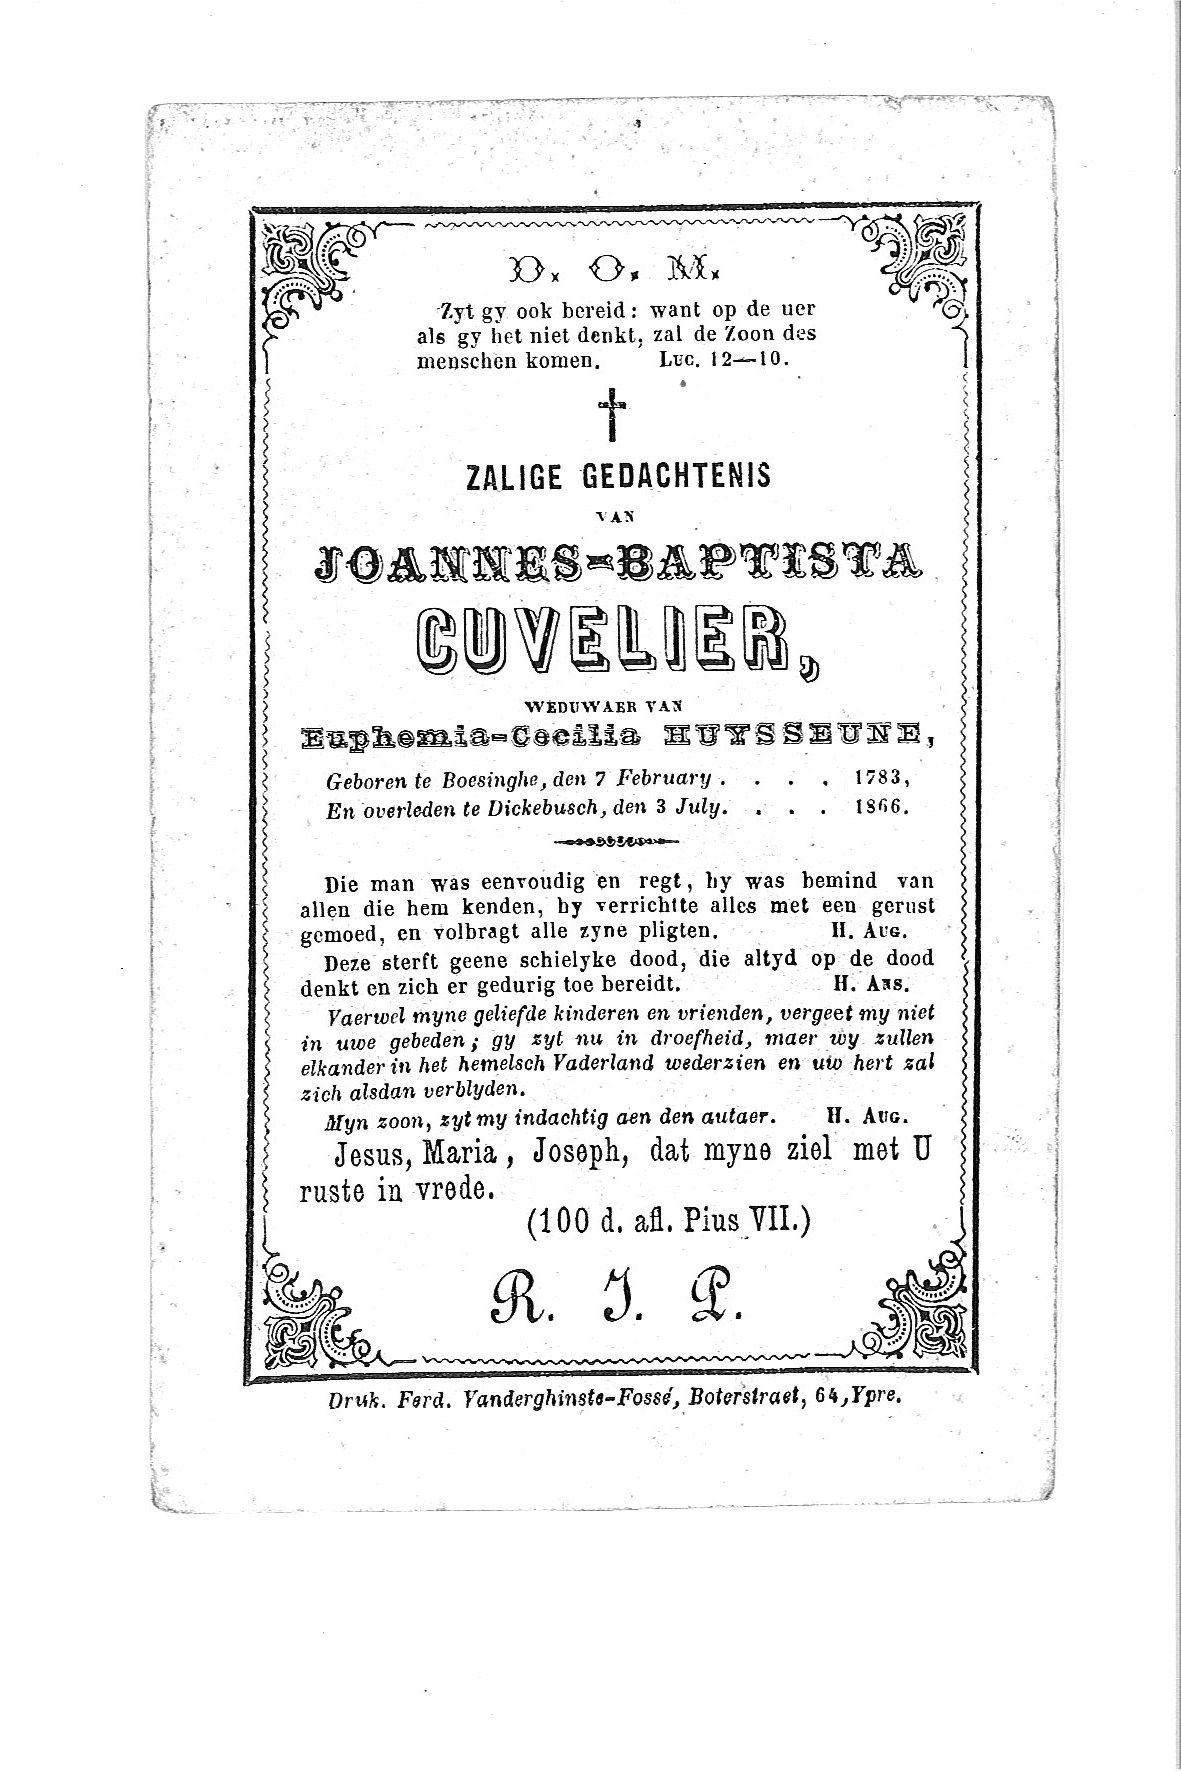 joannes-baptista(1866)20090323101150_00021.jpg